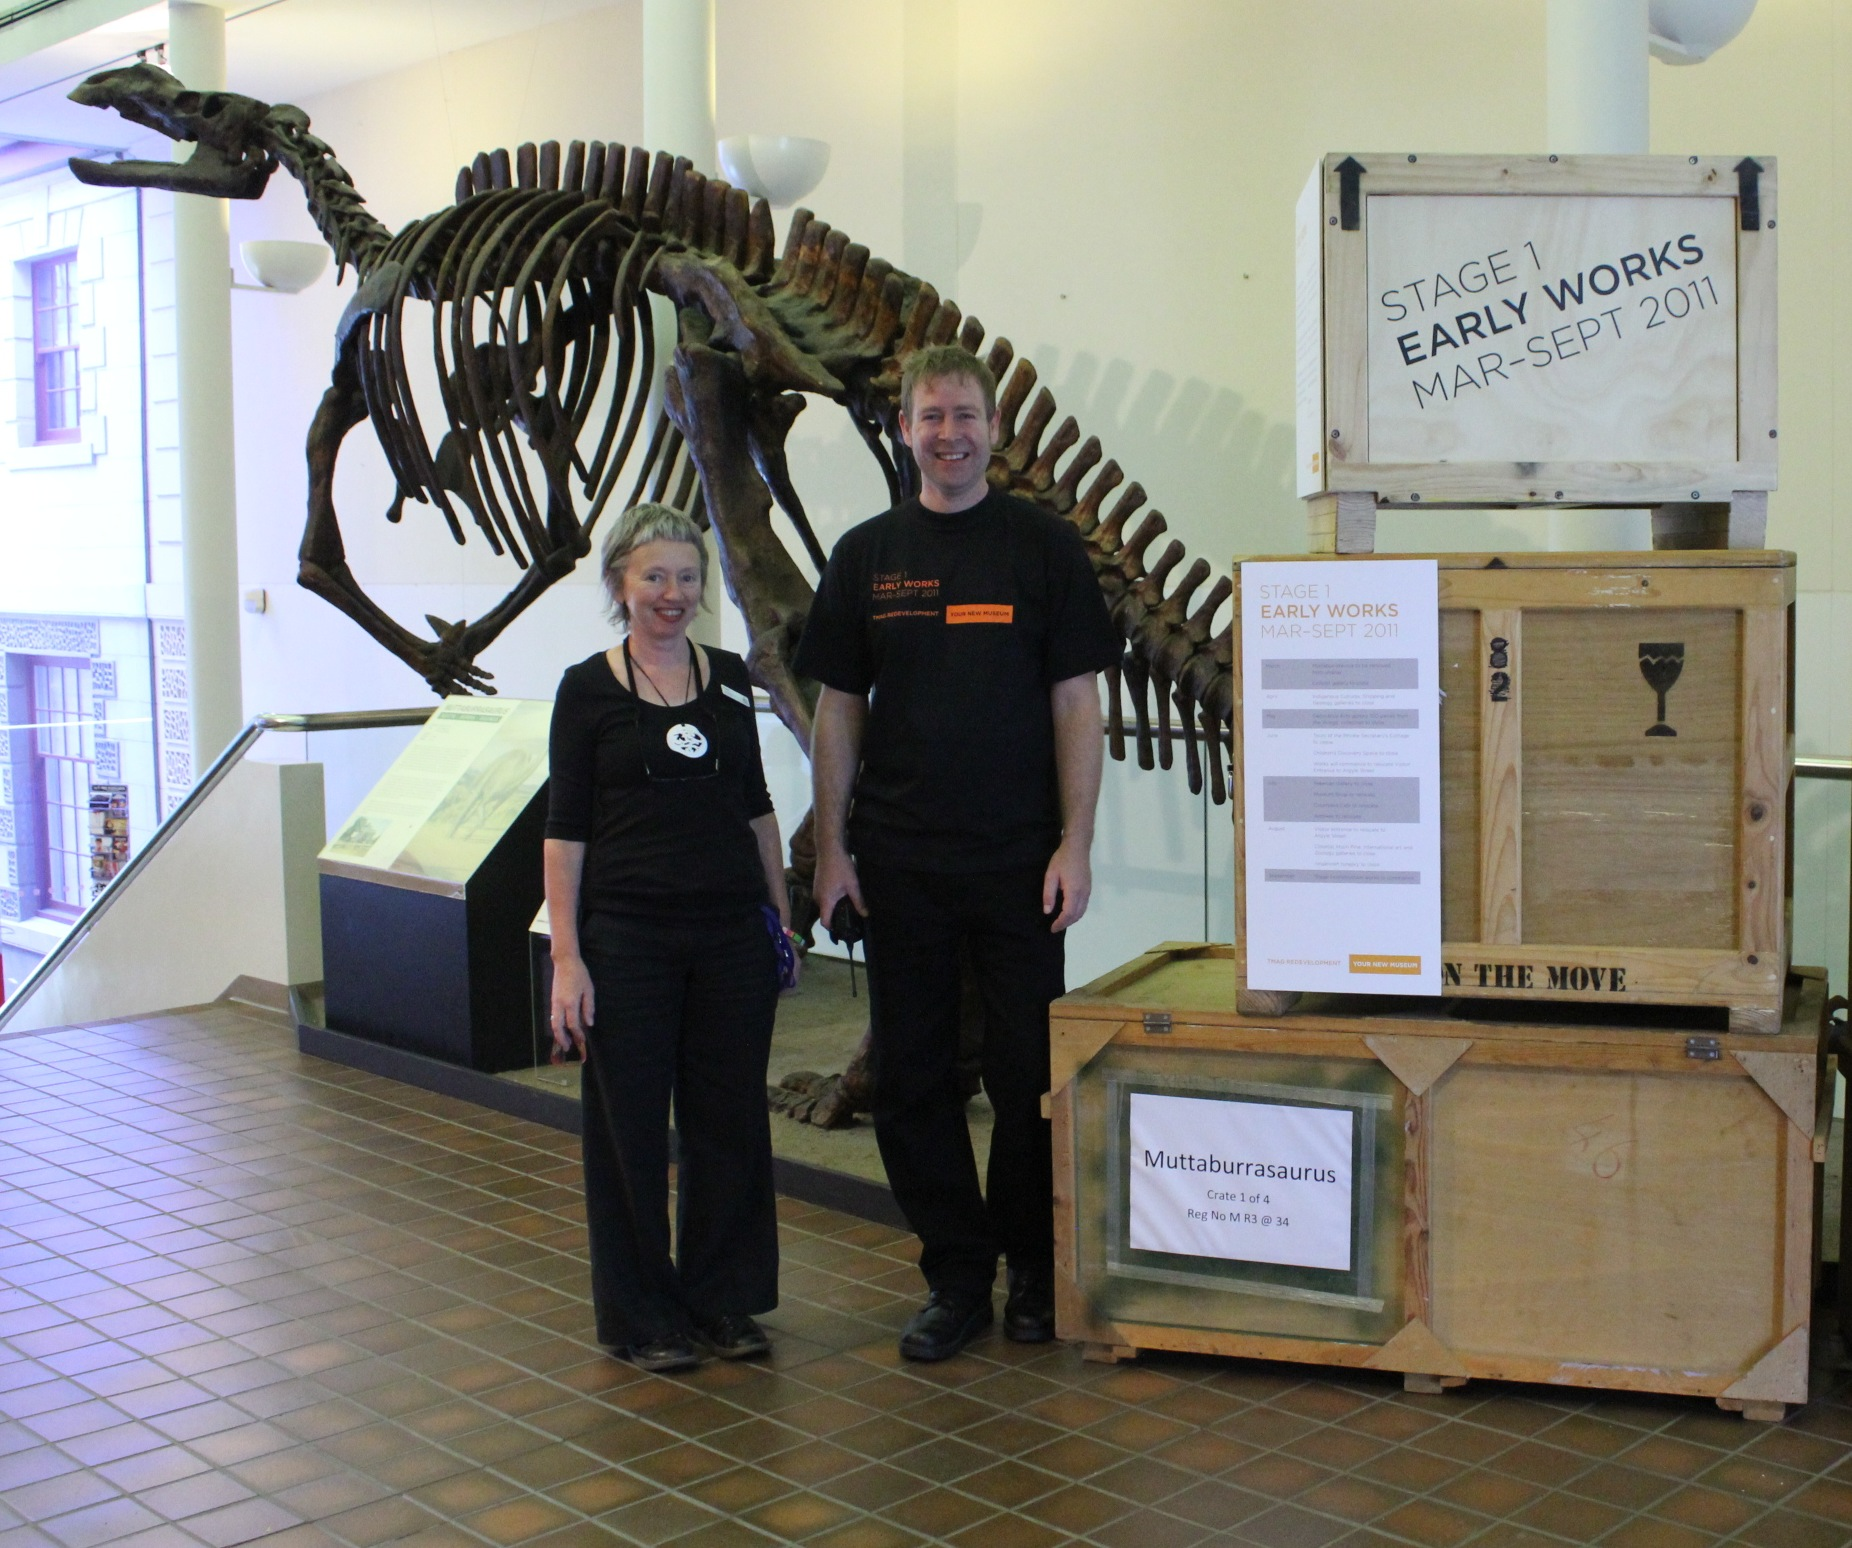 Penny and Matt with our beloved muttaburrasaurus